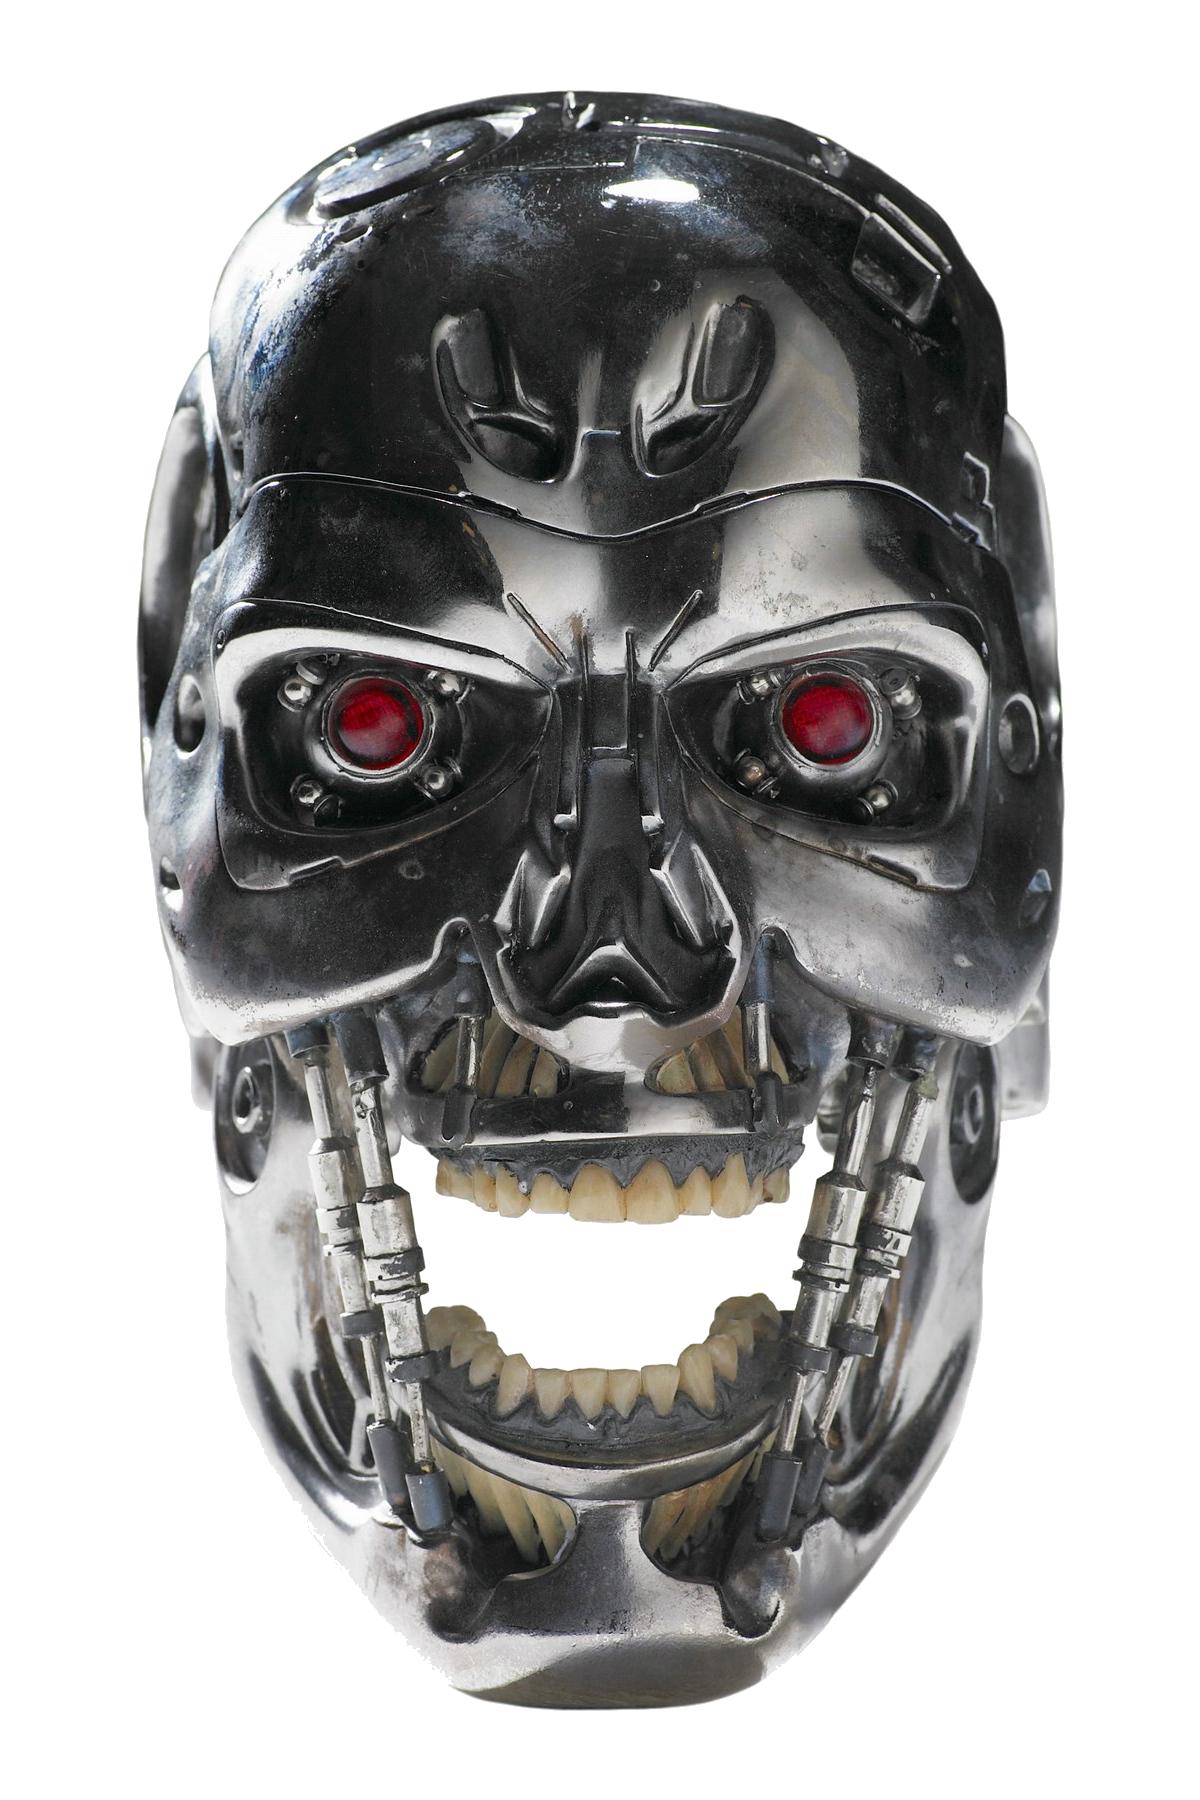 Terminator HD PNG Transparent Terminator HD.PNG Images..